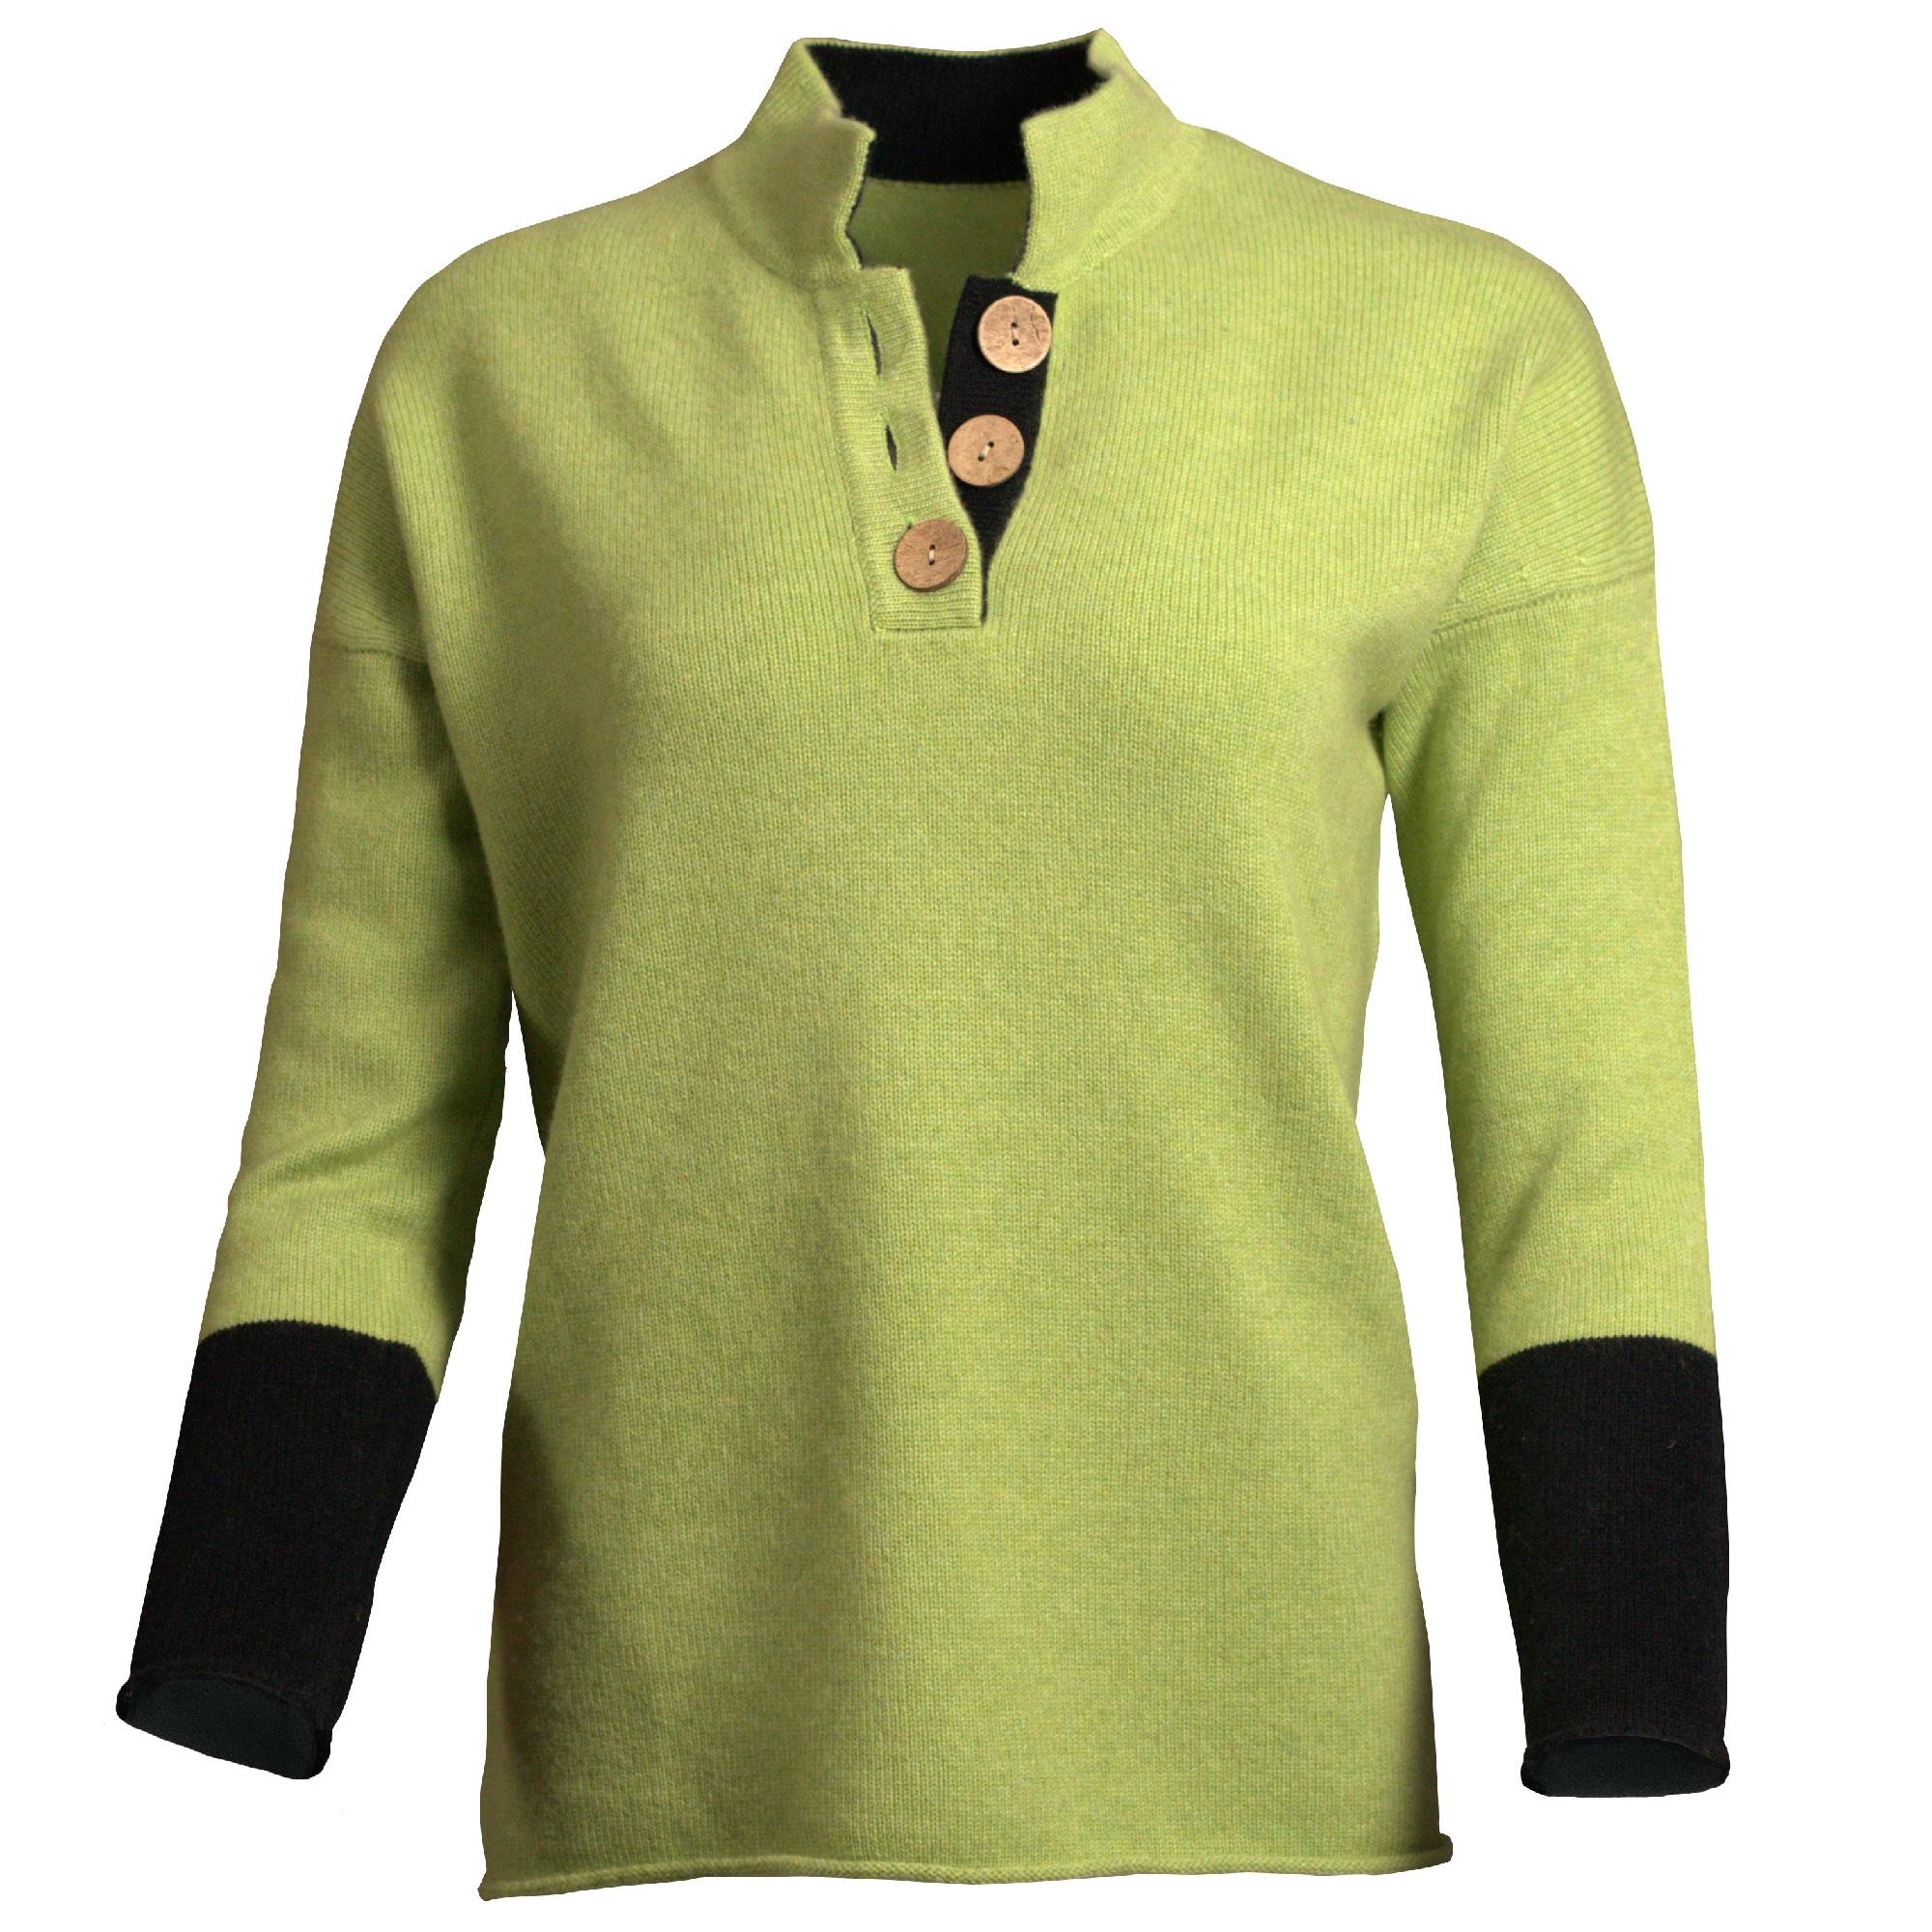 High Collar Jumper – Lime Green/Black